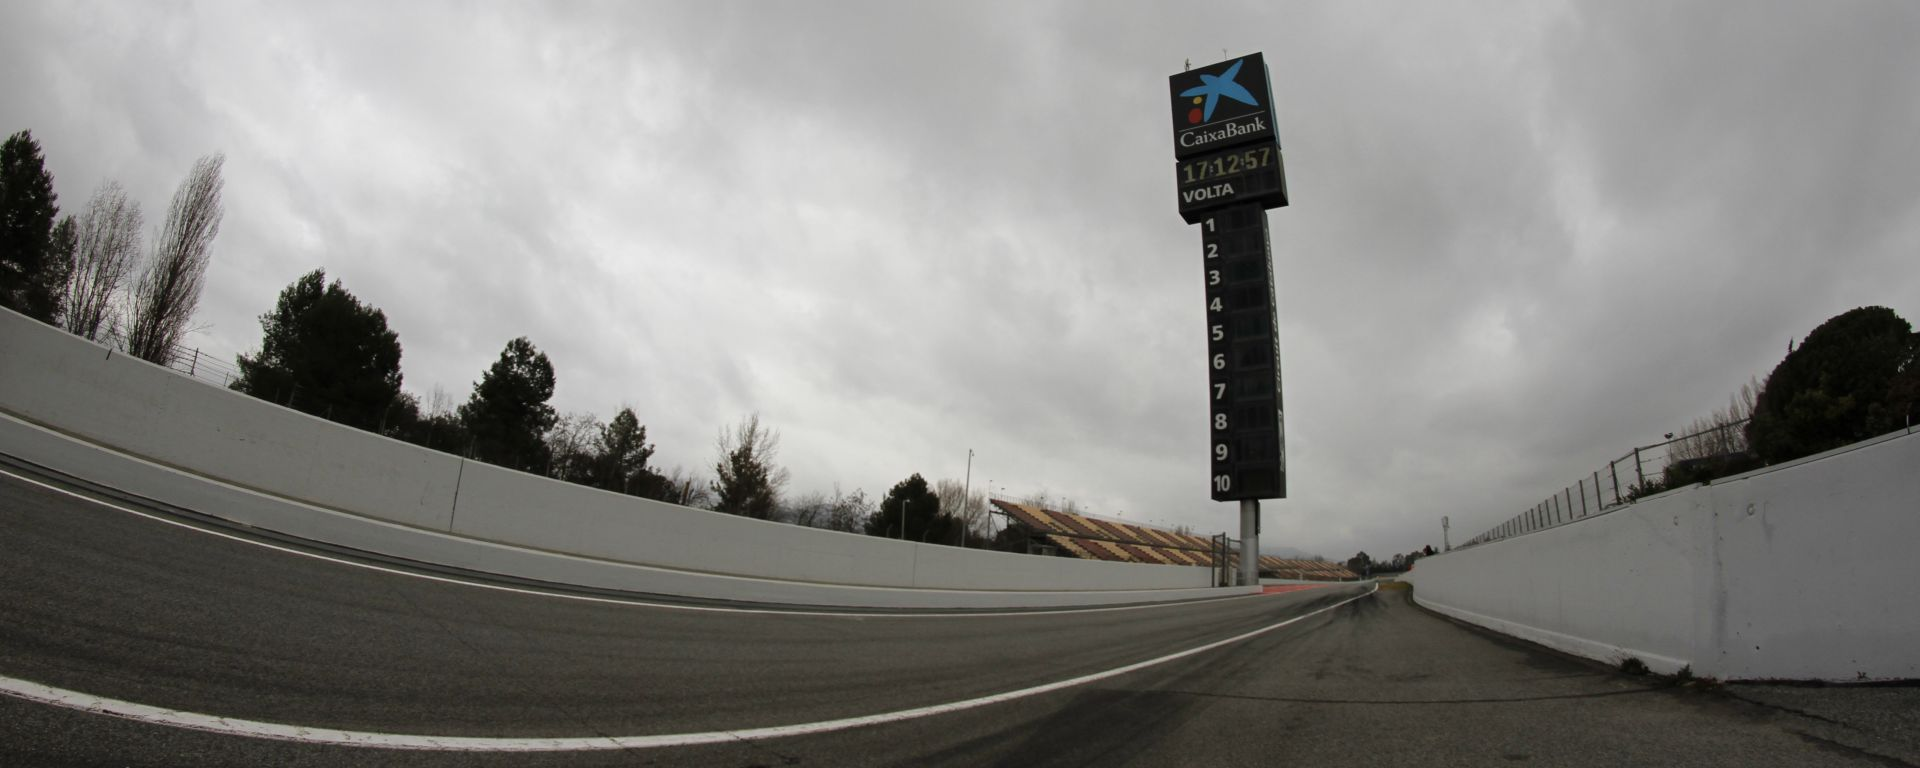 Circuit of Catalunya, Montmelò (Barcellona)